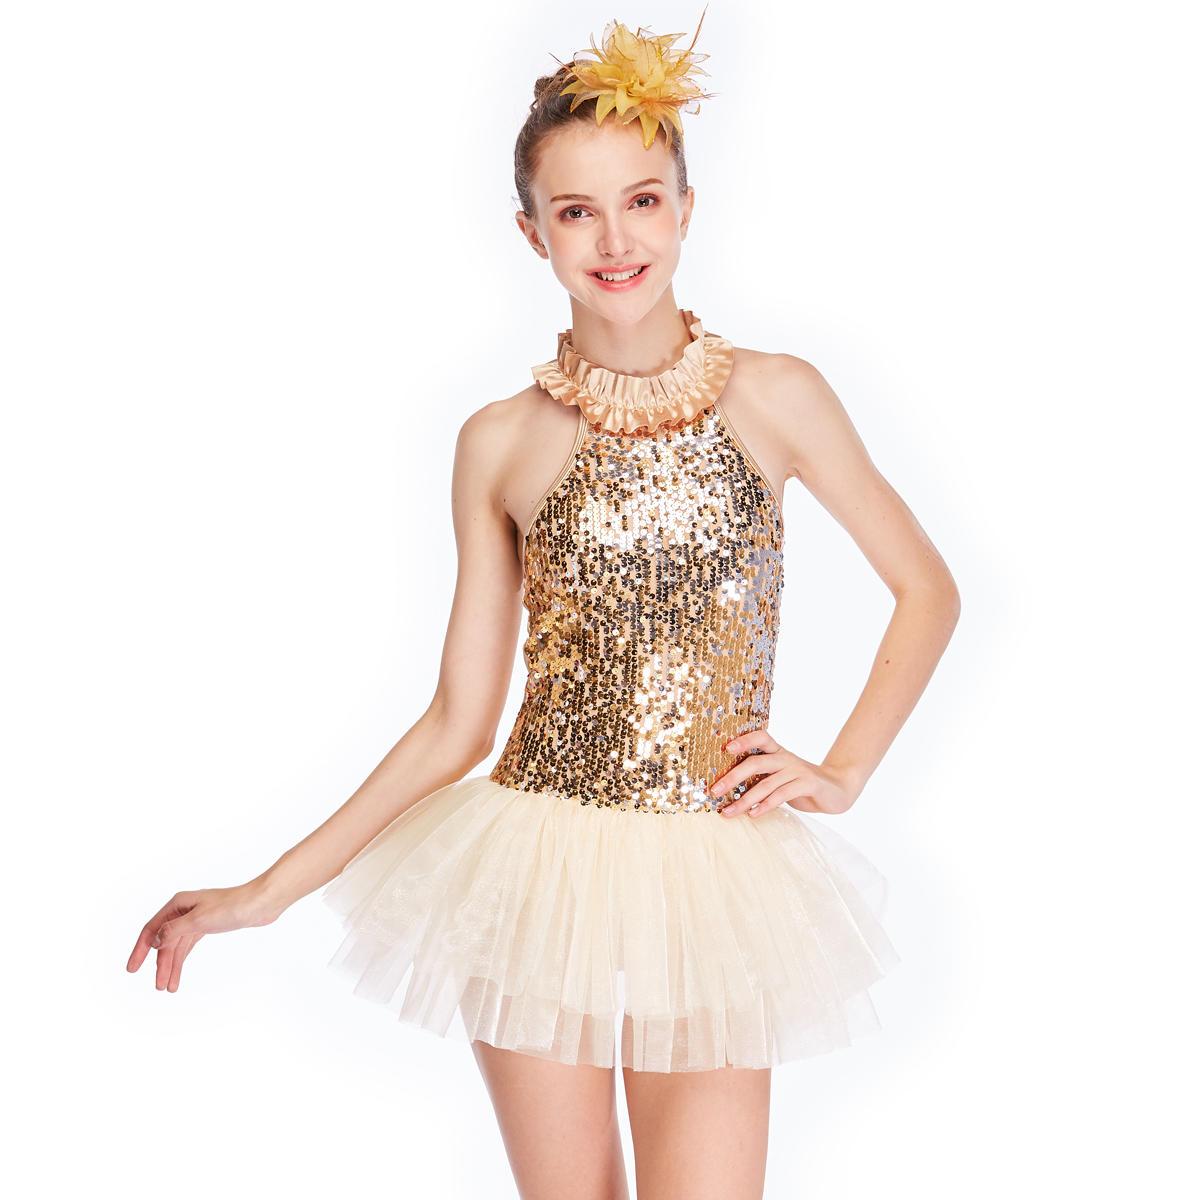 MiDee Tutu  Floral Neckline Sequined Ballet Dance Leotard Dance Costume